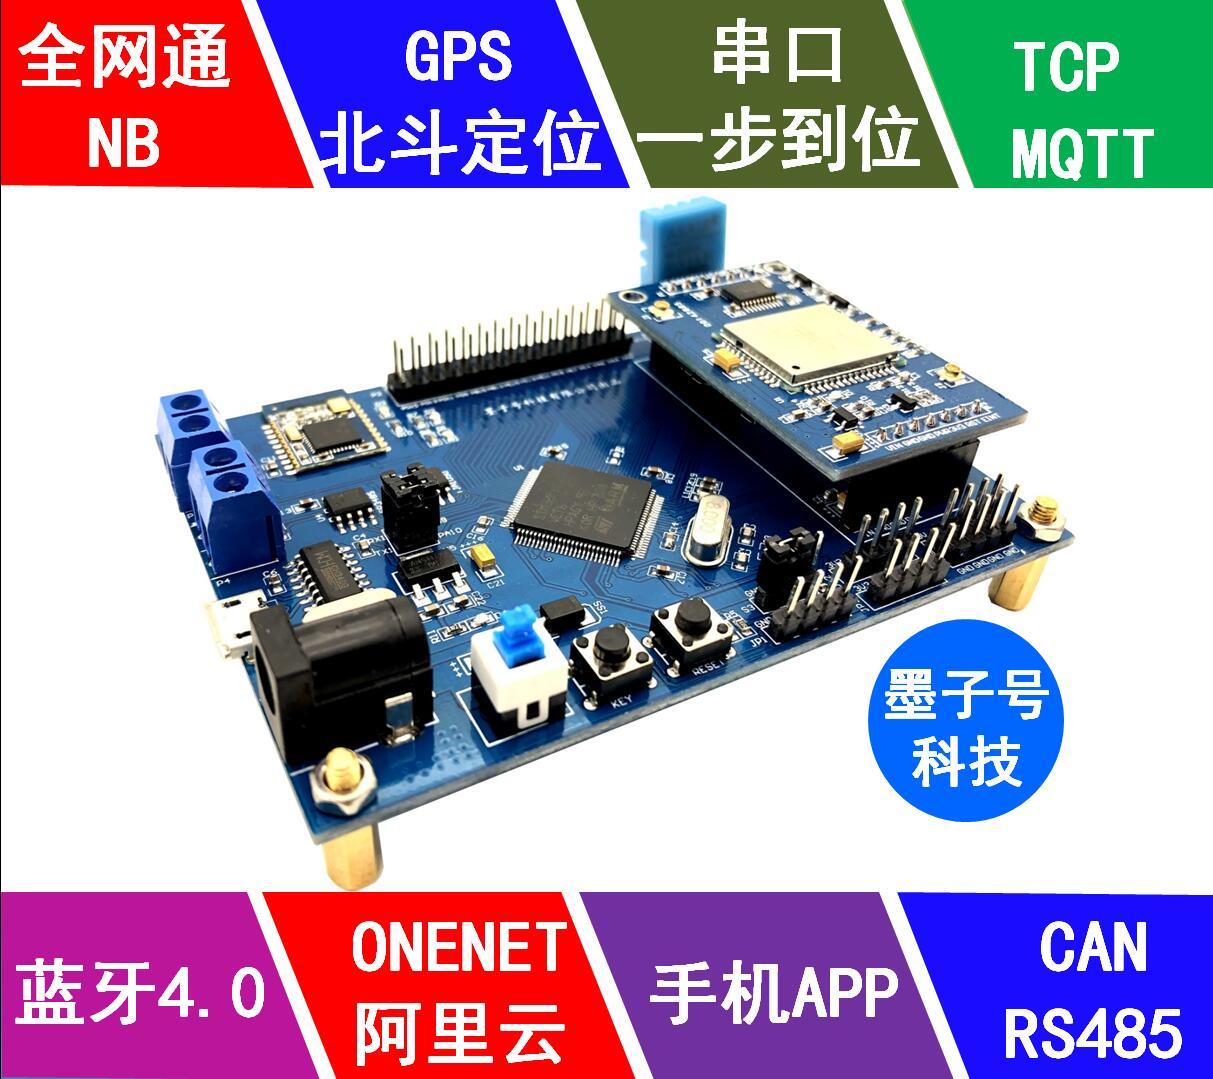 STM32 Development Board BC20 Full Netcom Module GPS Beidou Location NBIOT Internet of Things MQTT Bluetooth Protocol